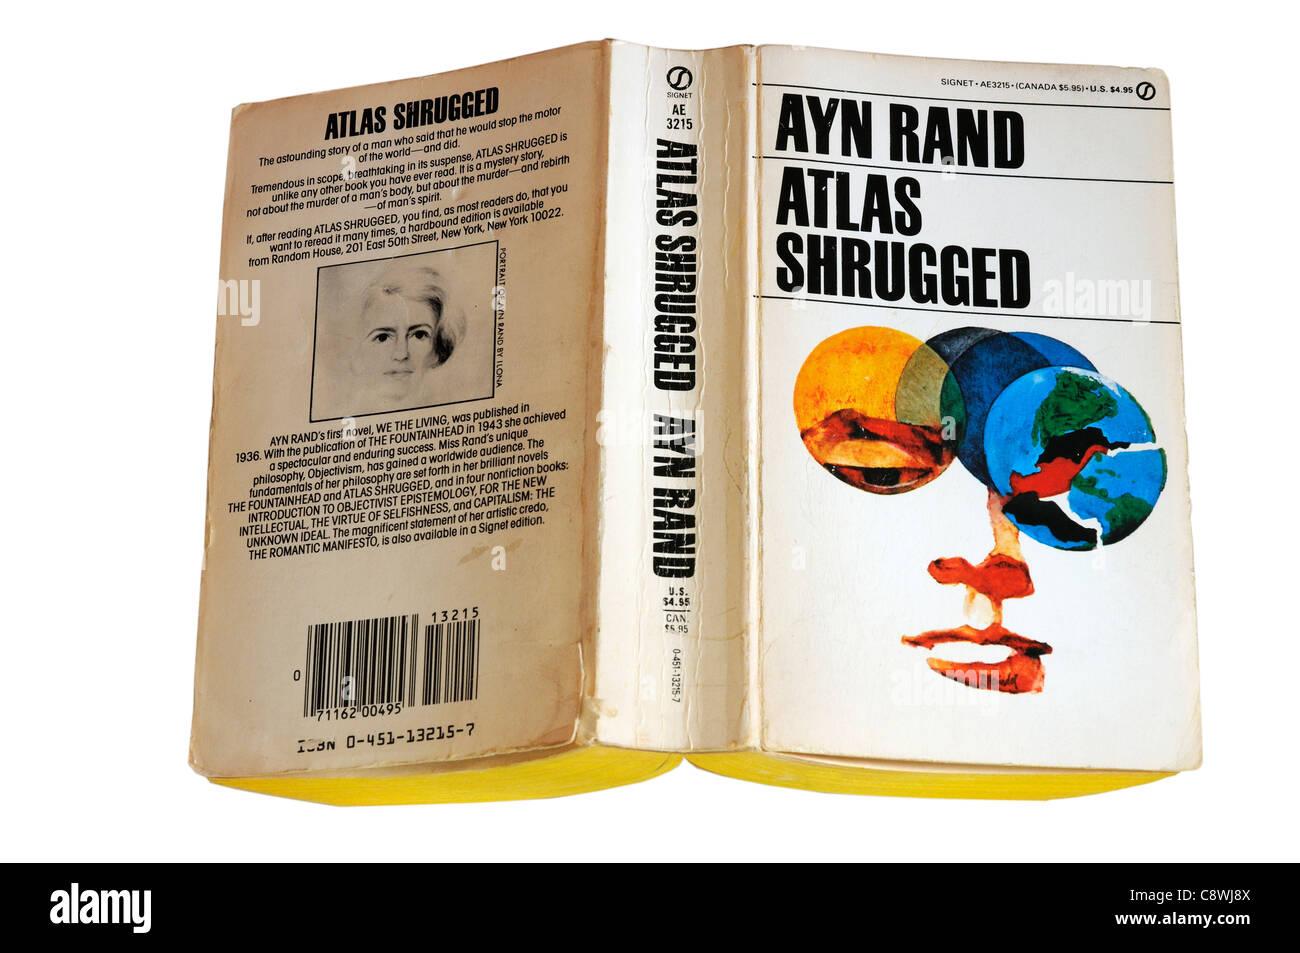 Atlas Shrugged by Ayn Rand - Stock Image